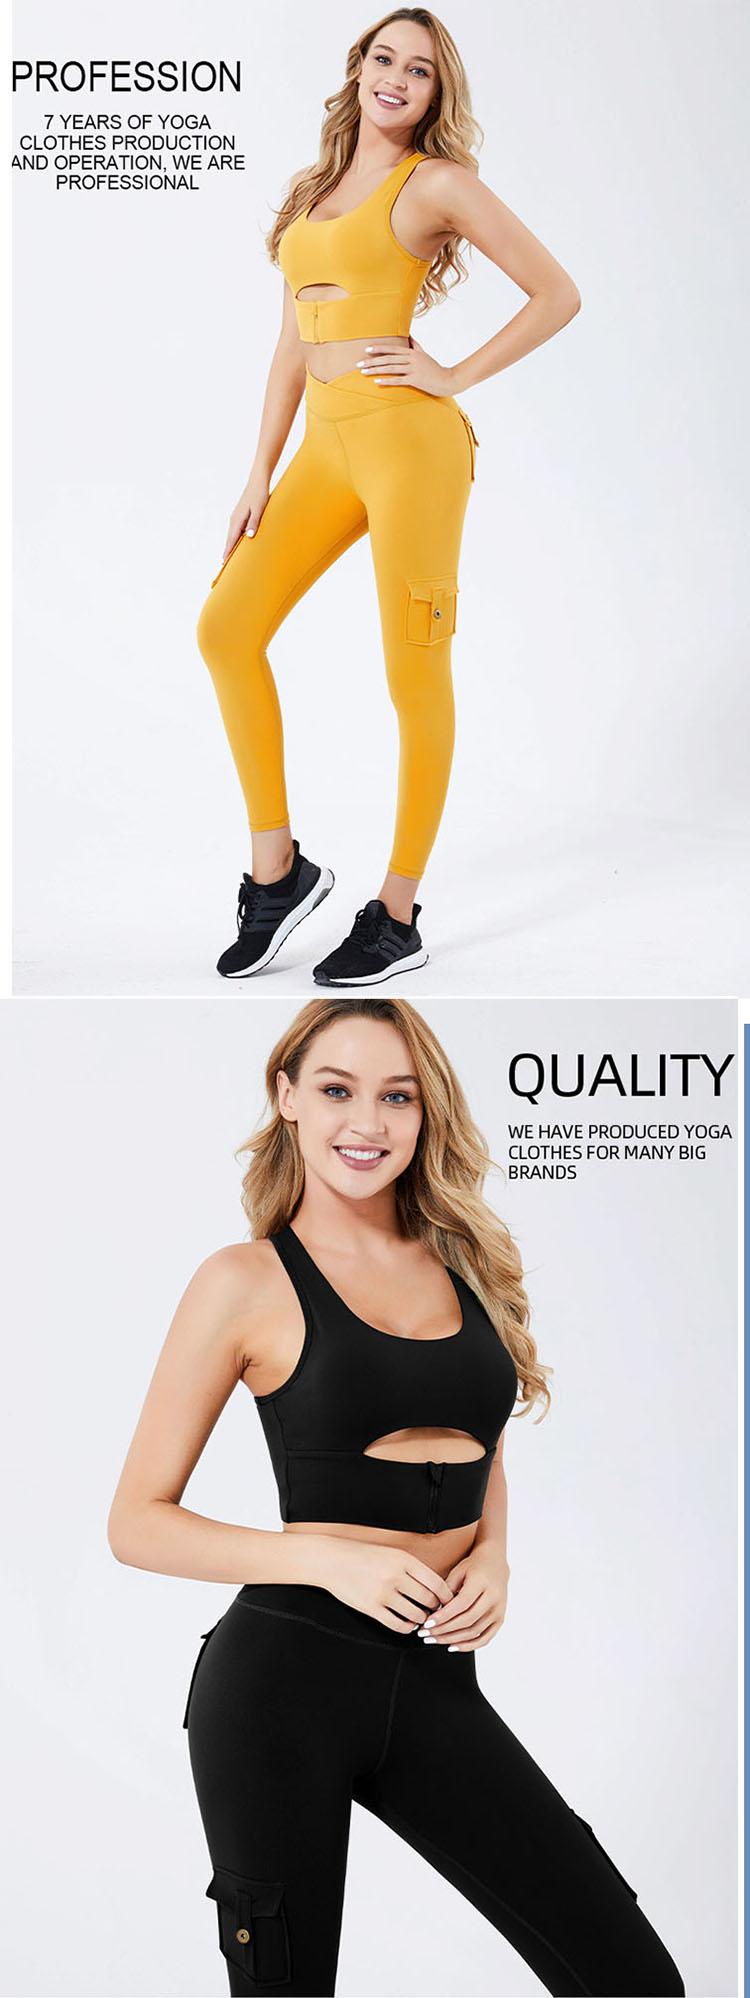 Mini patch pockets, zipper decorative pockets, and back waist pockets make yoga pants both practical and decorative